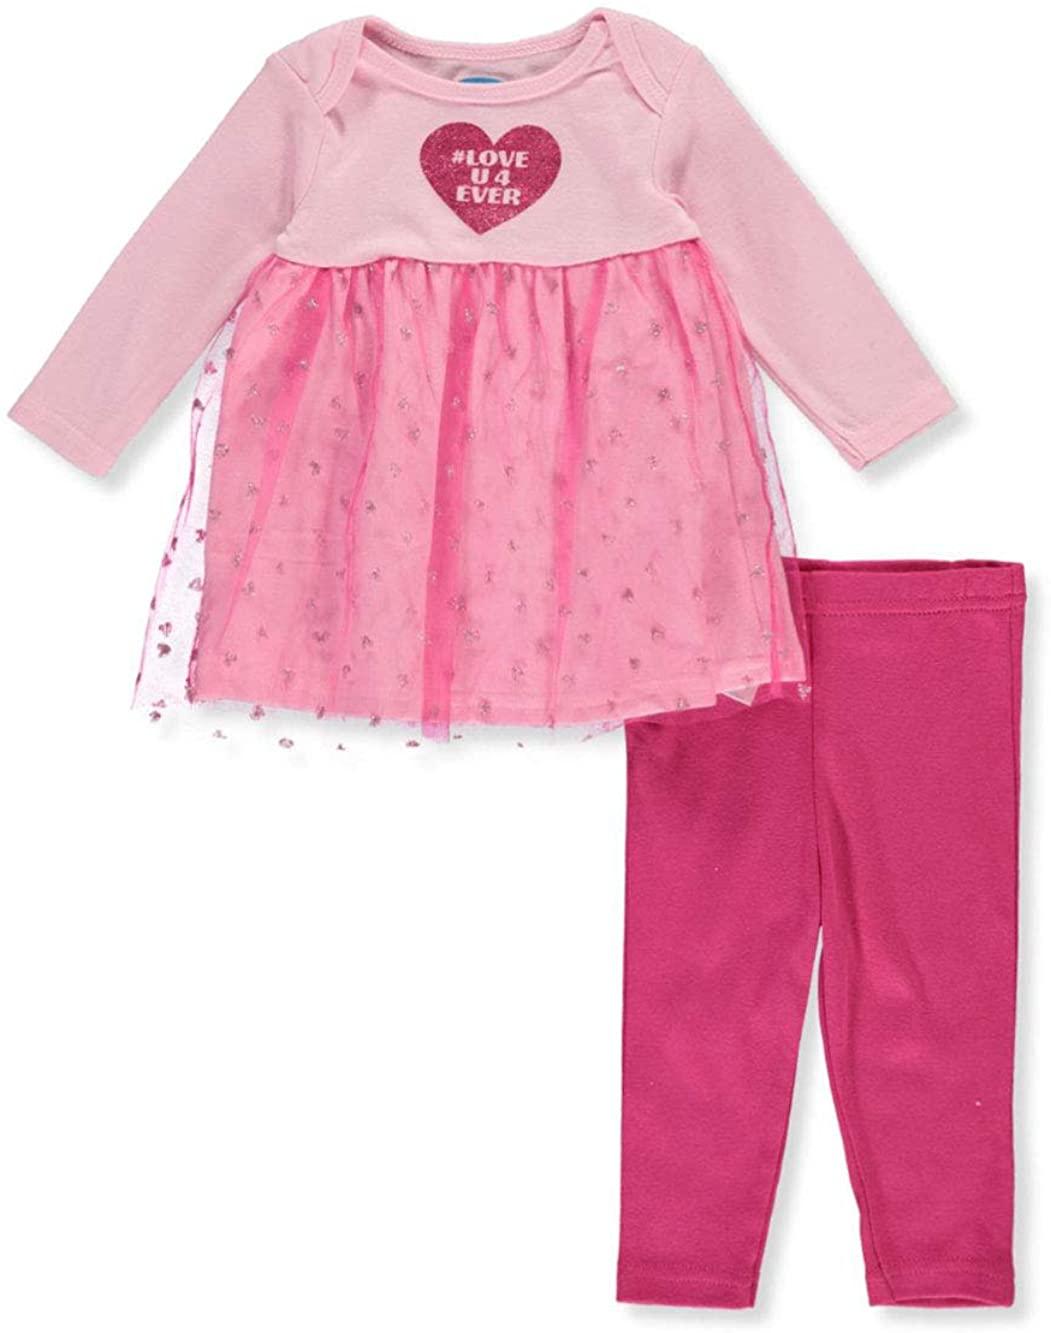 Bon Bebe Baby Girls Heart 2-Piece Leggings Set Outfit